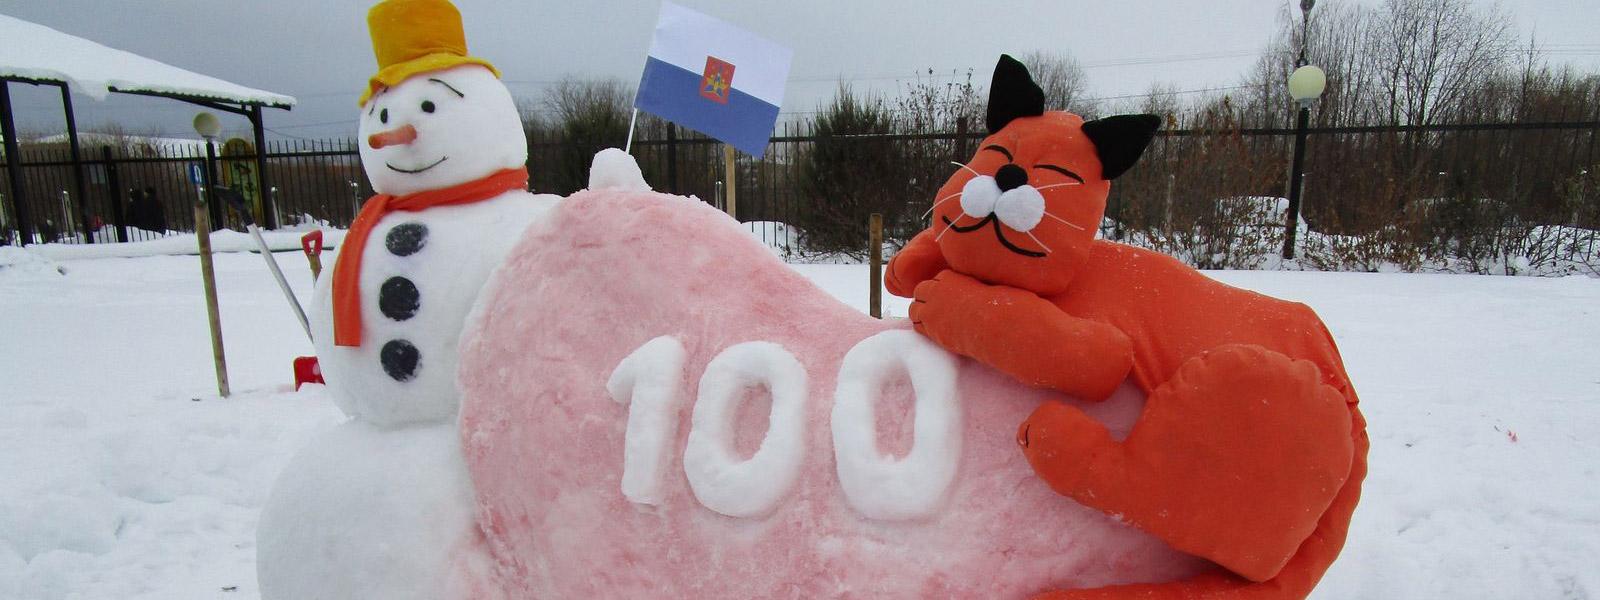 Коту и снеговику 100 лет!